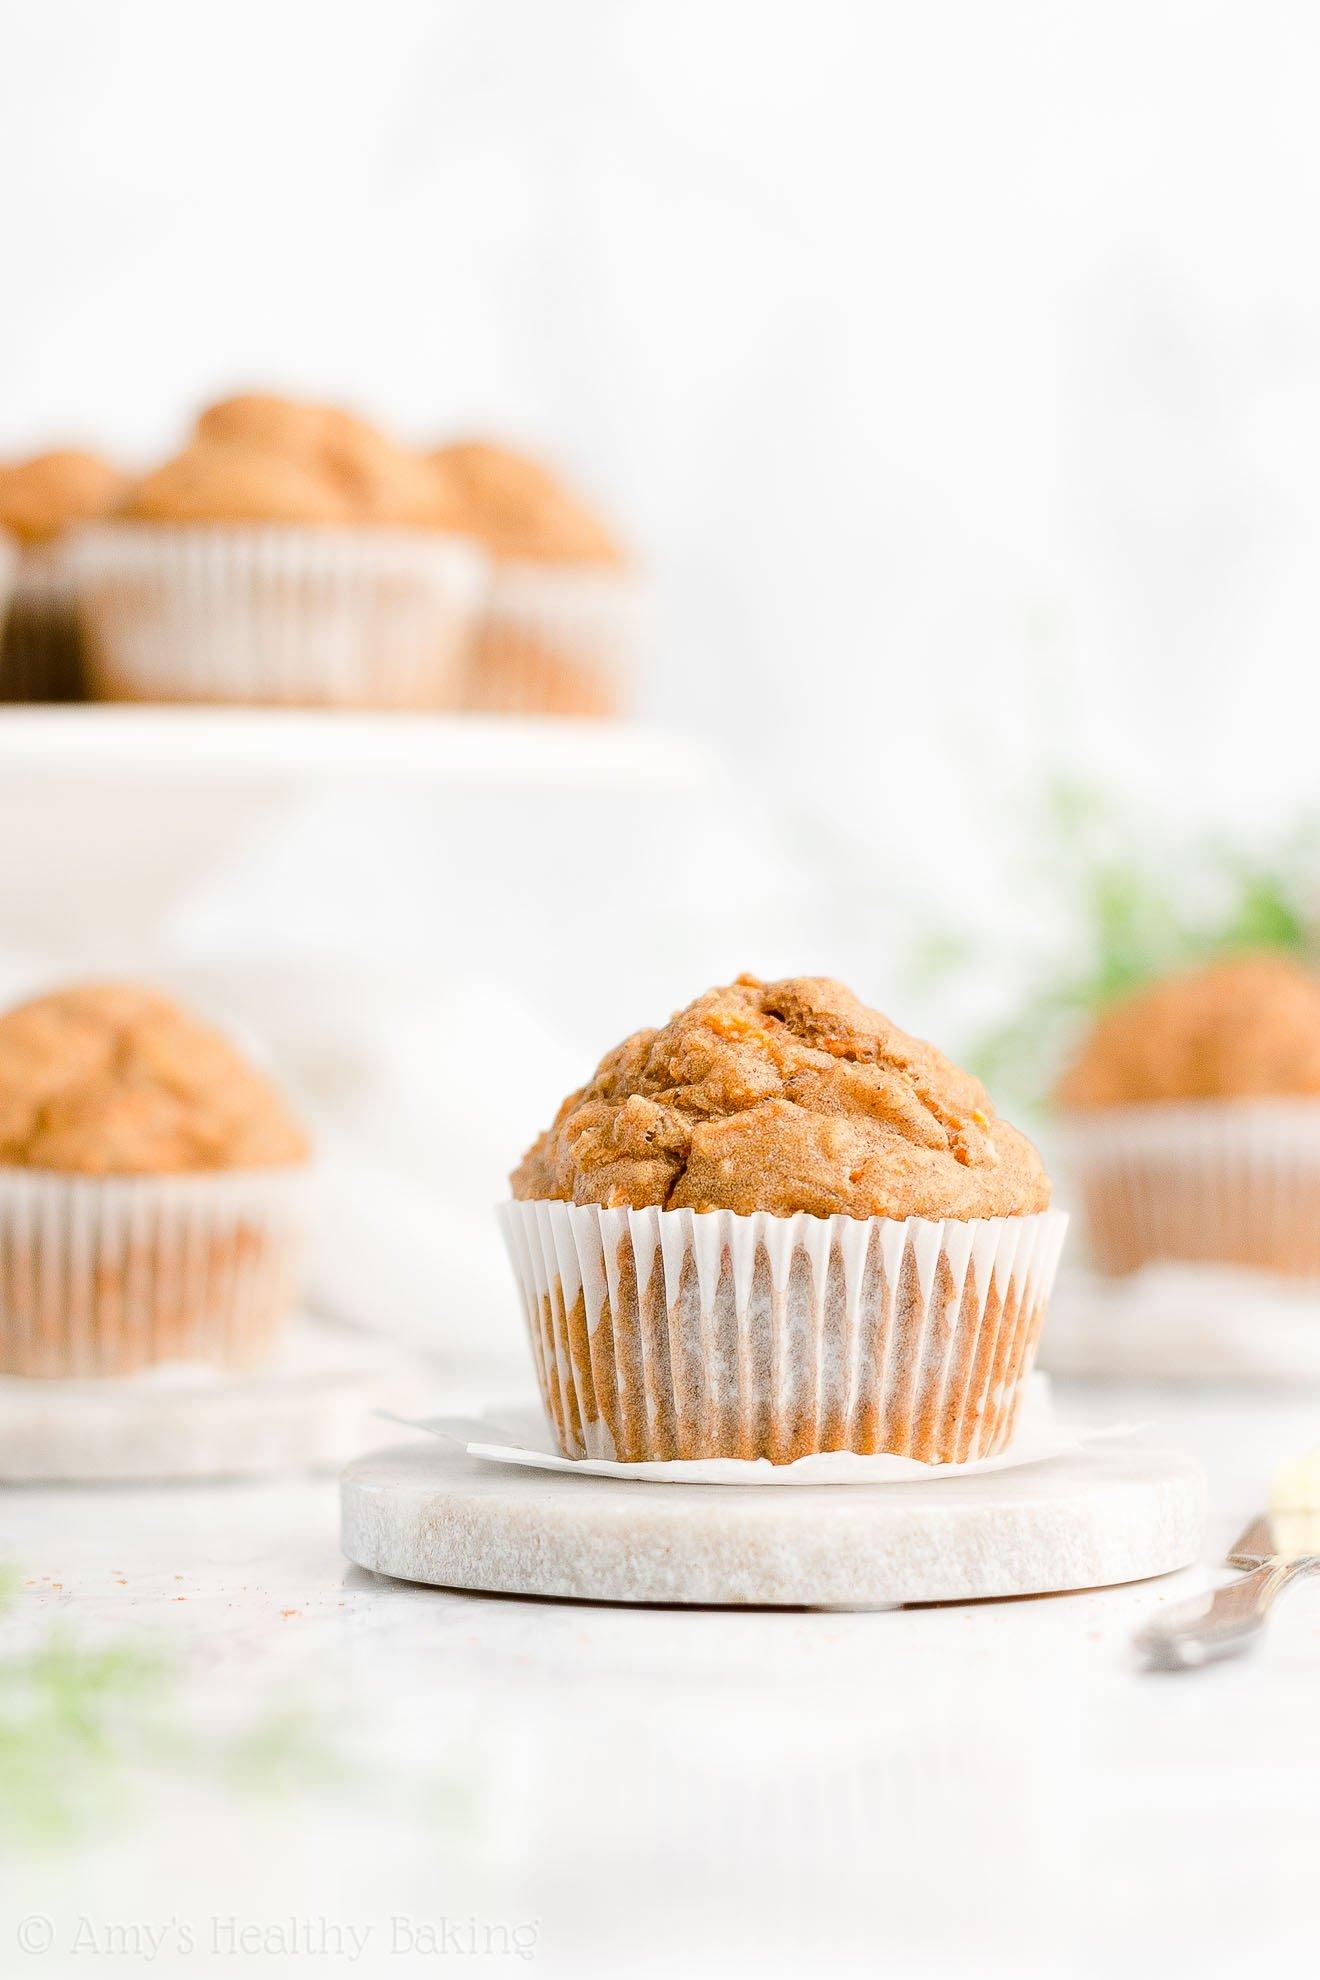 Best Easy Healthy Whole Wheat Low Fat Moist Carrot Cake Oatmeal Muffins